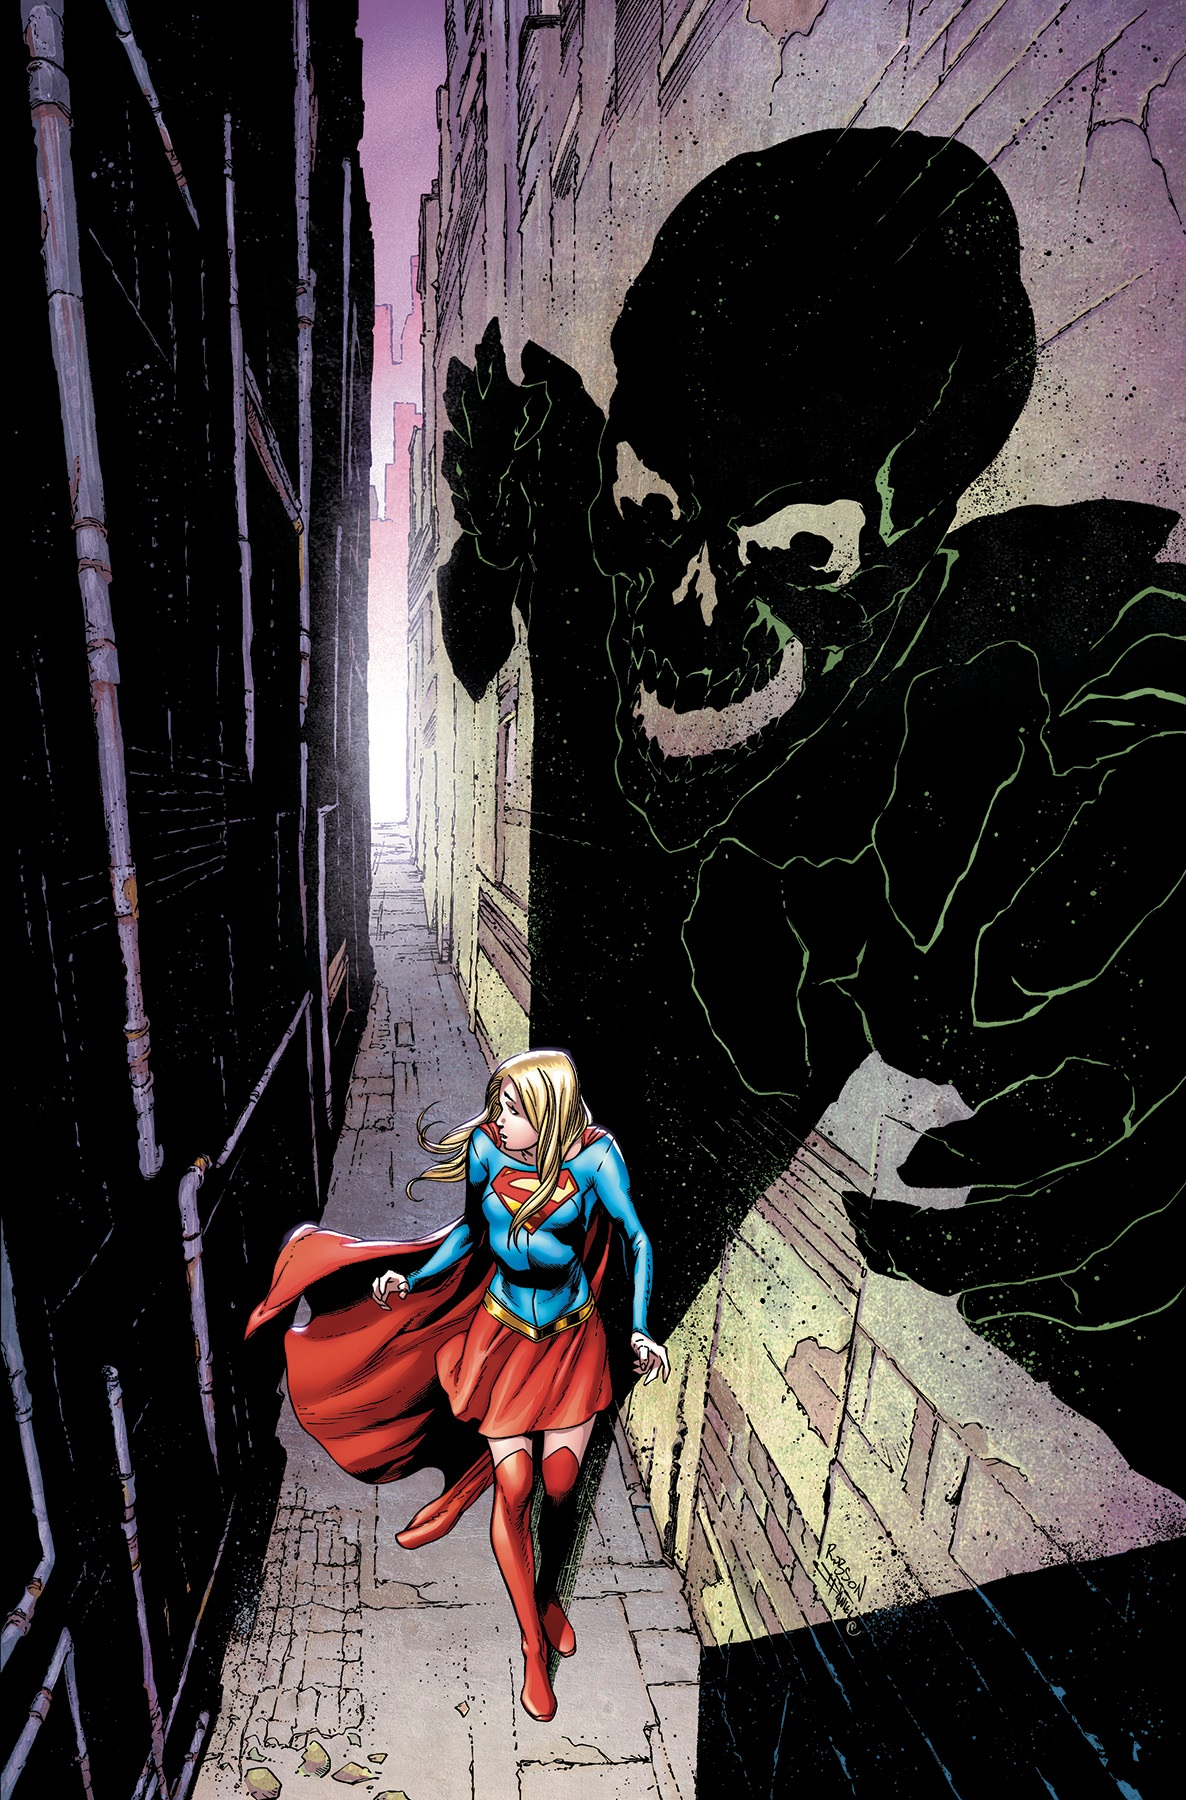 Supergirl Vol 7 18 Textless.jpg